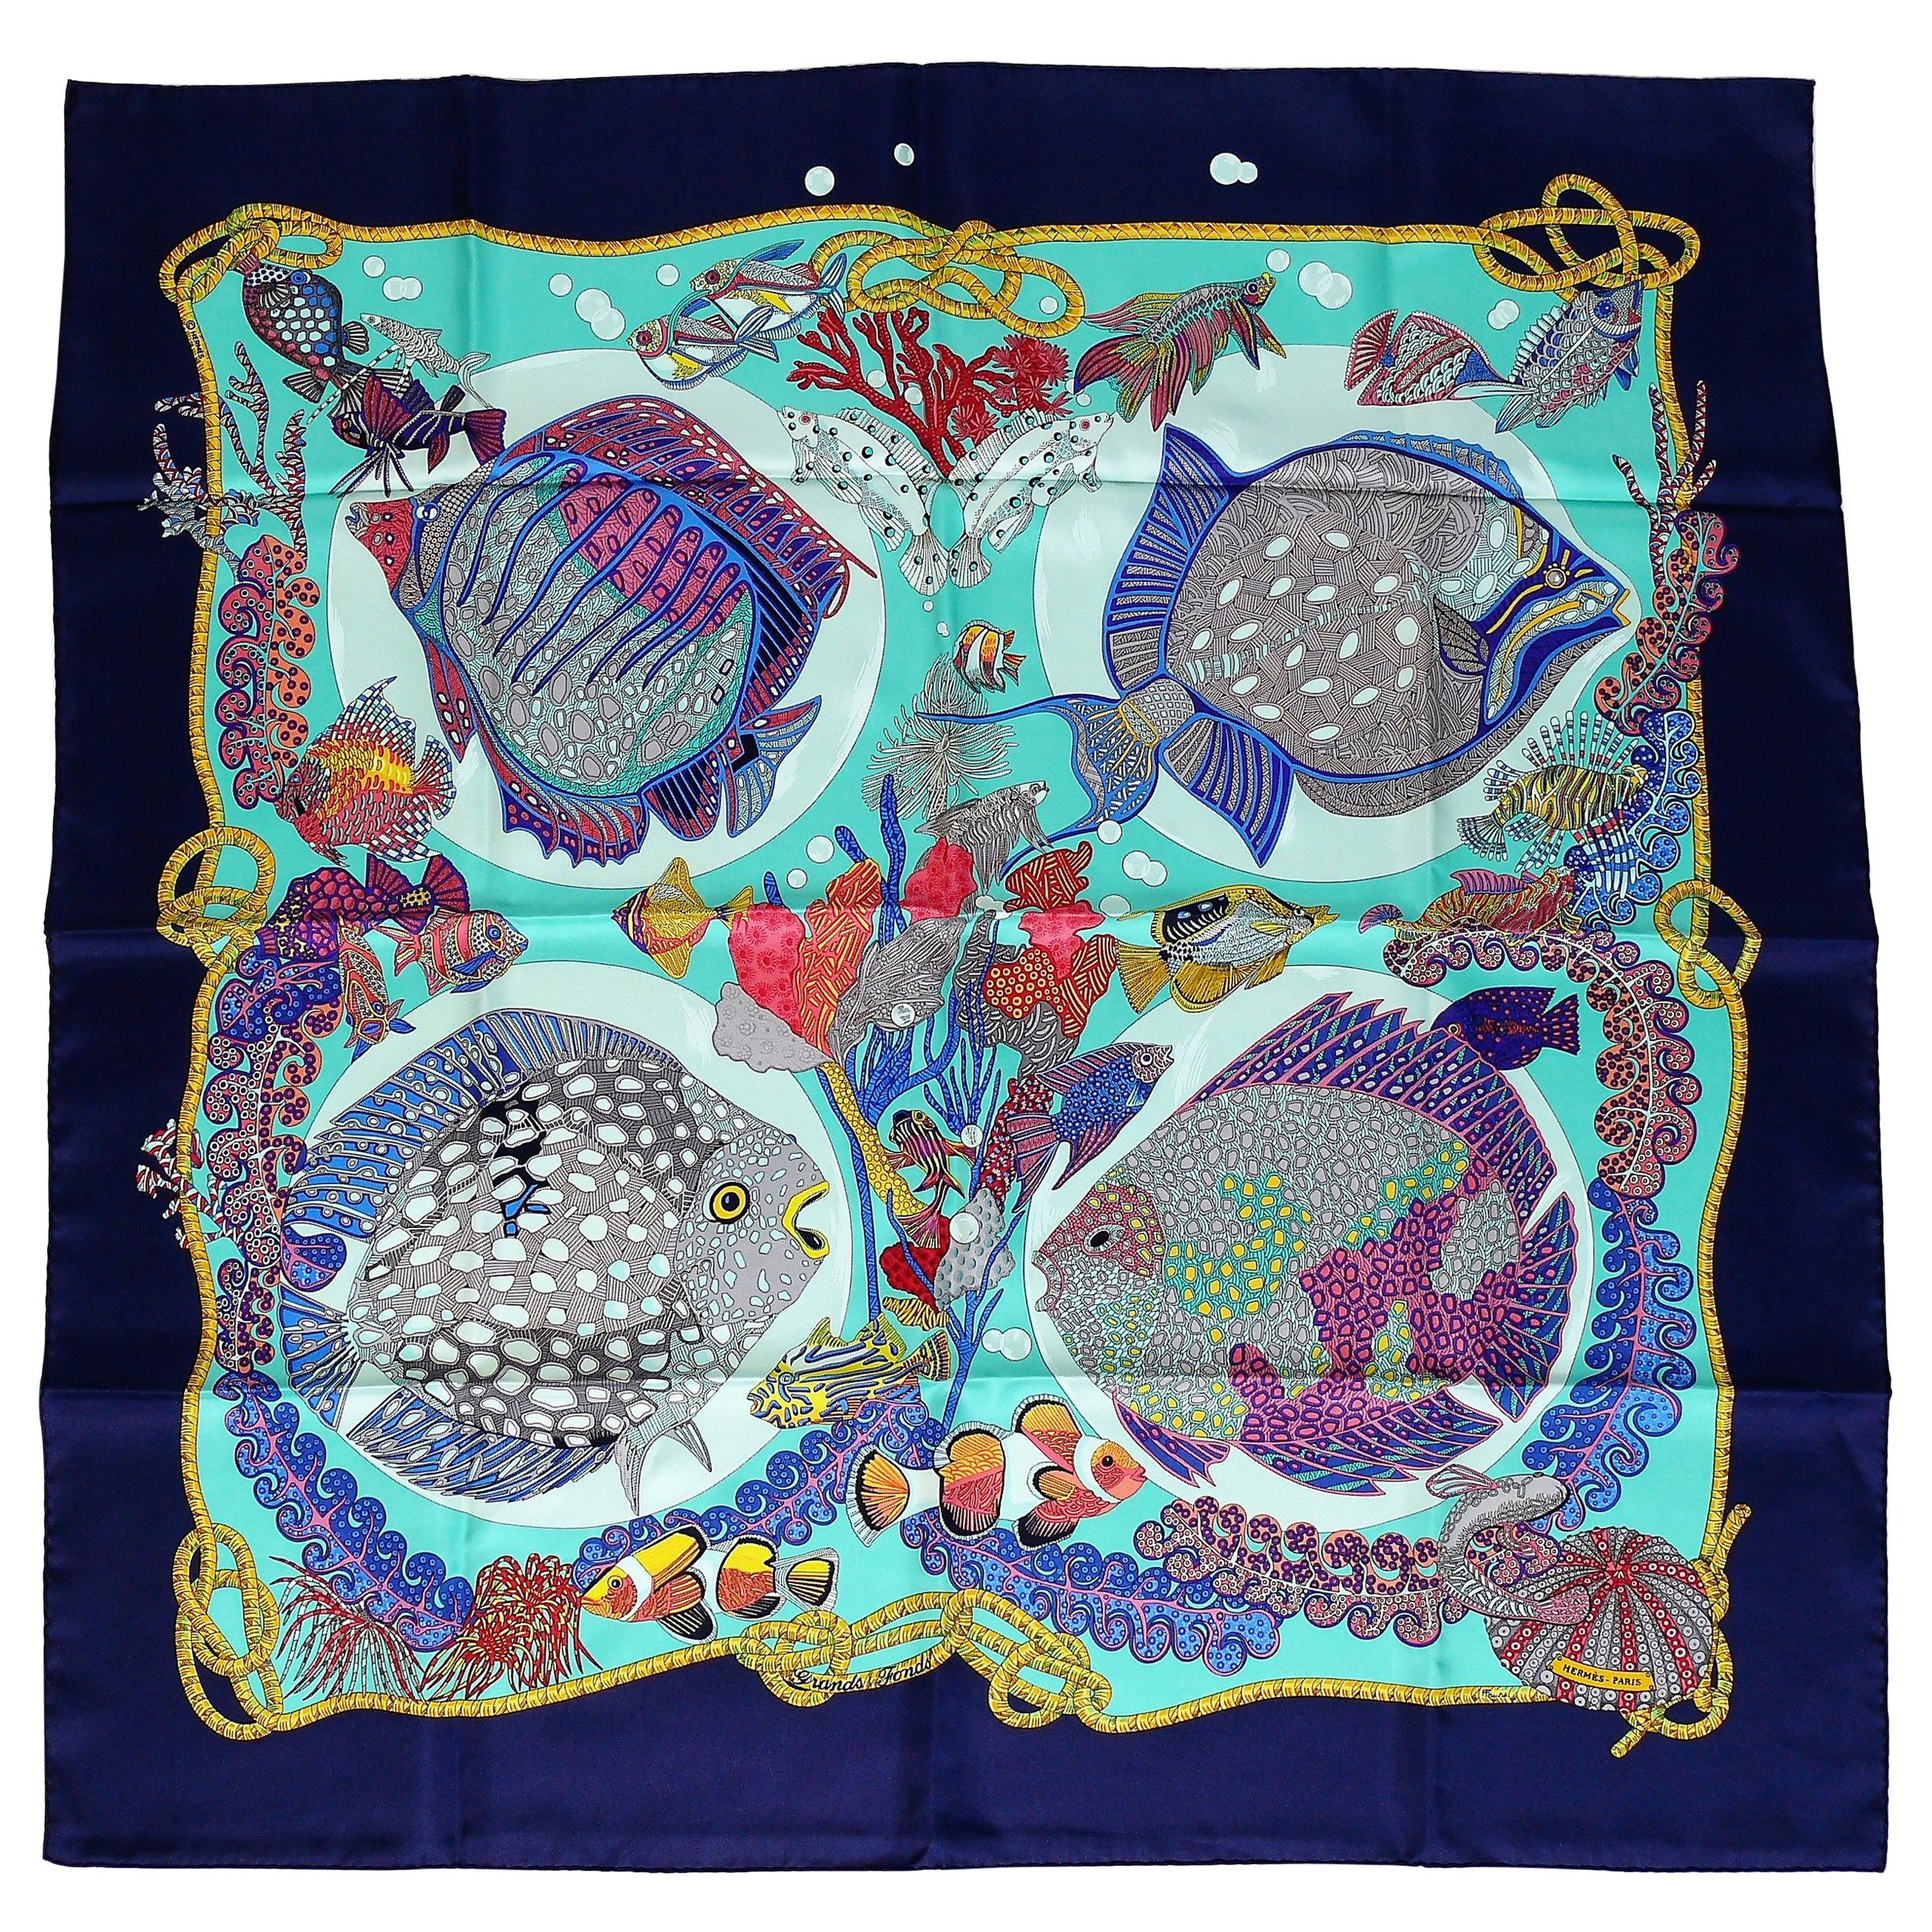 Hermes Vintage Silk Carre Scarf Grands Fonds by Annie Faivre 1992